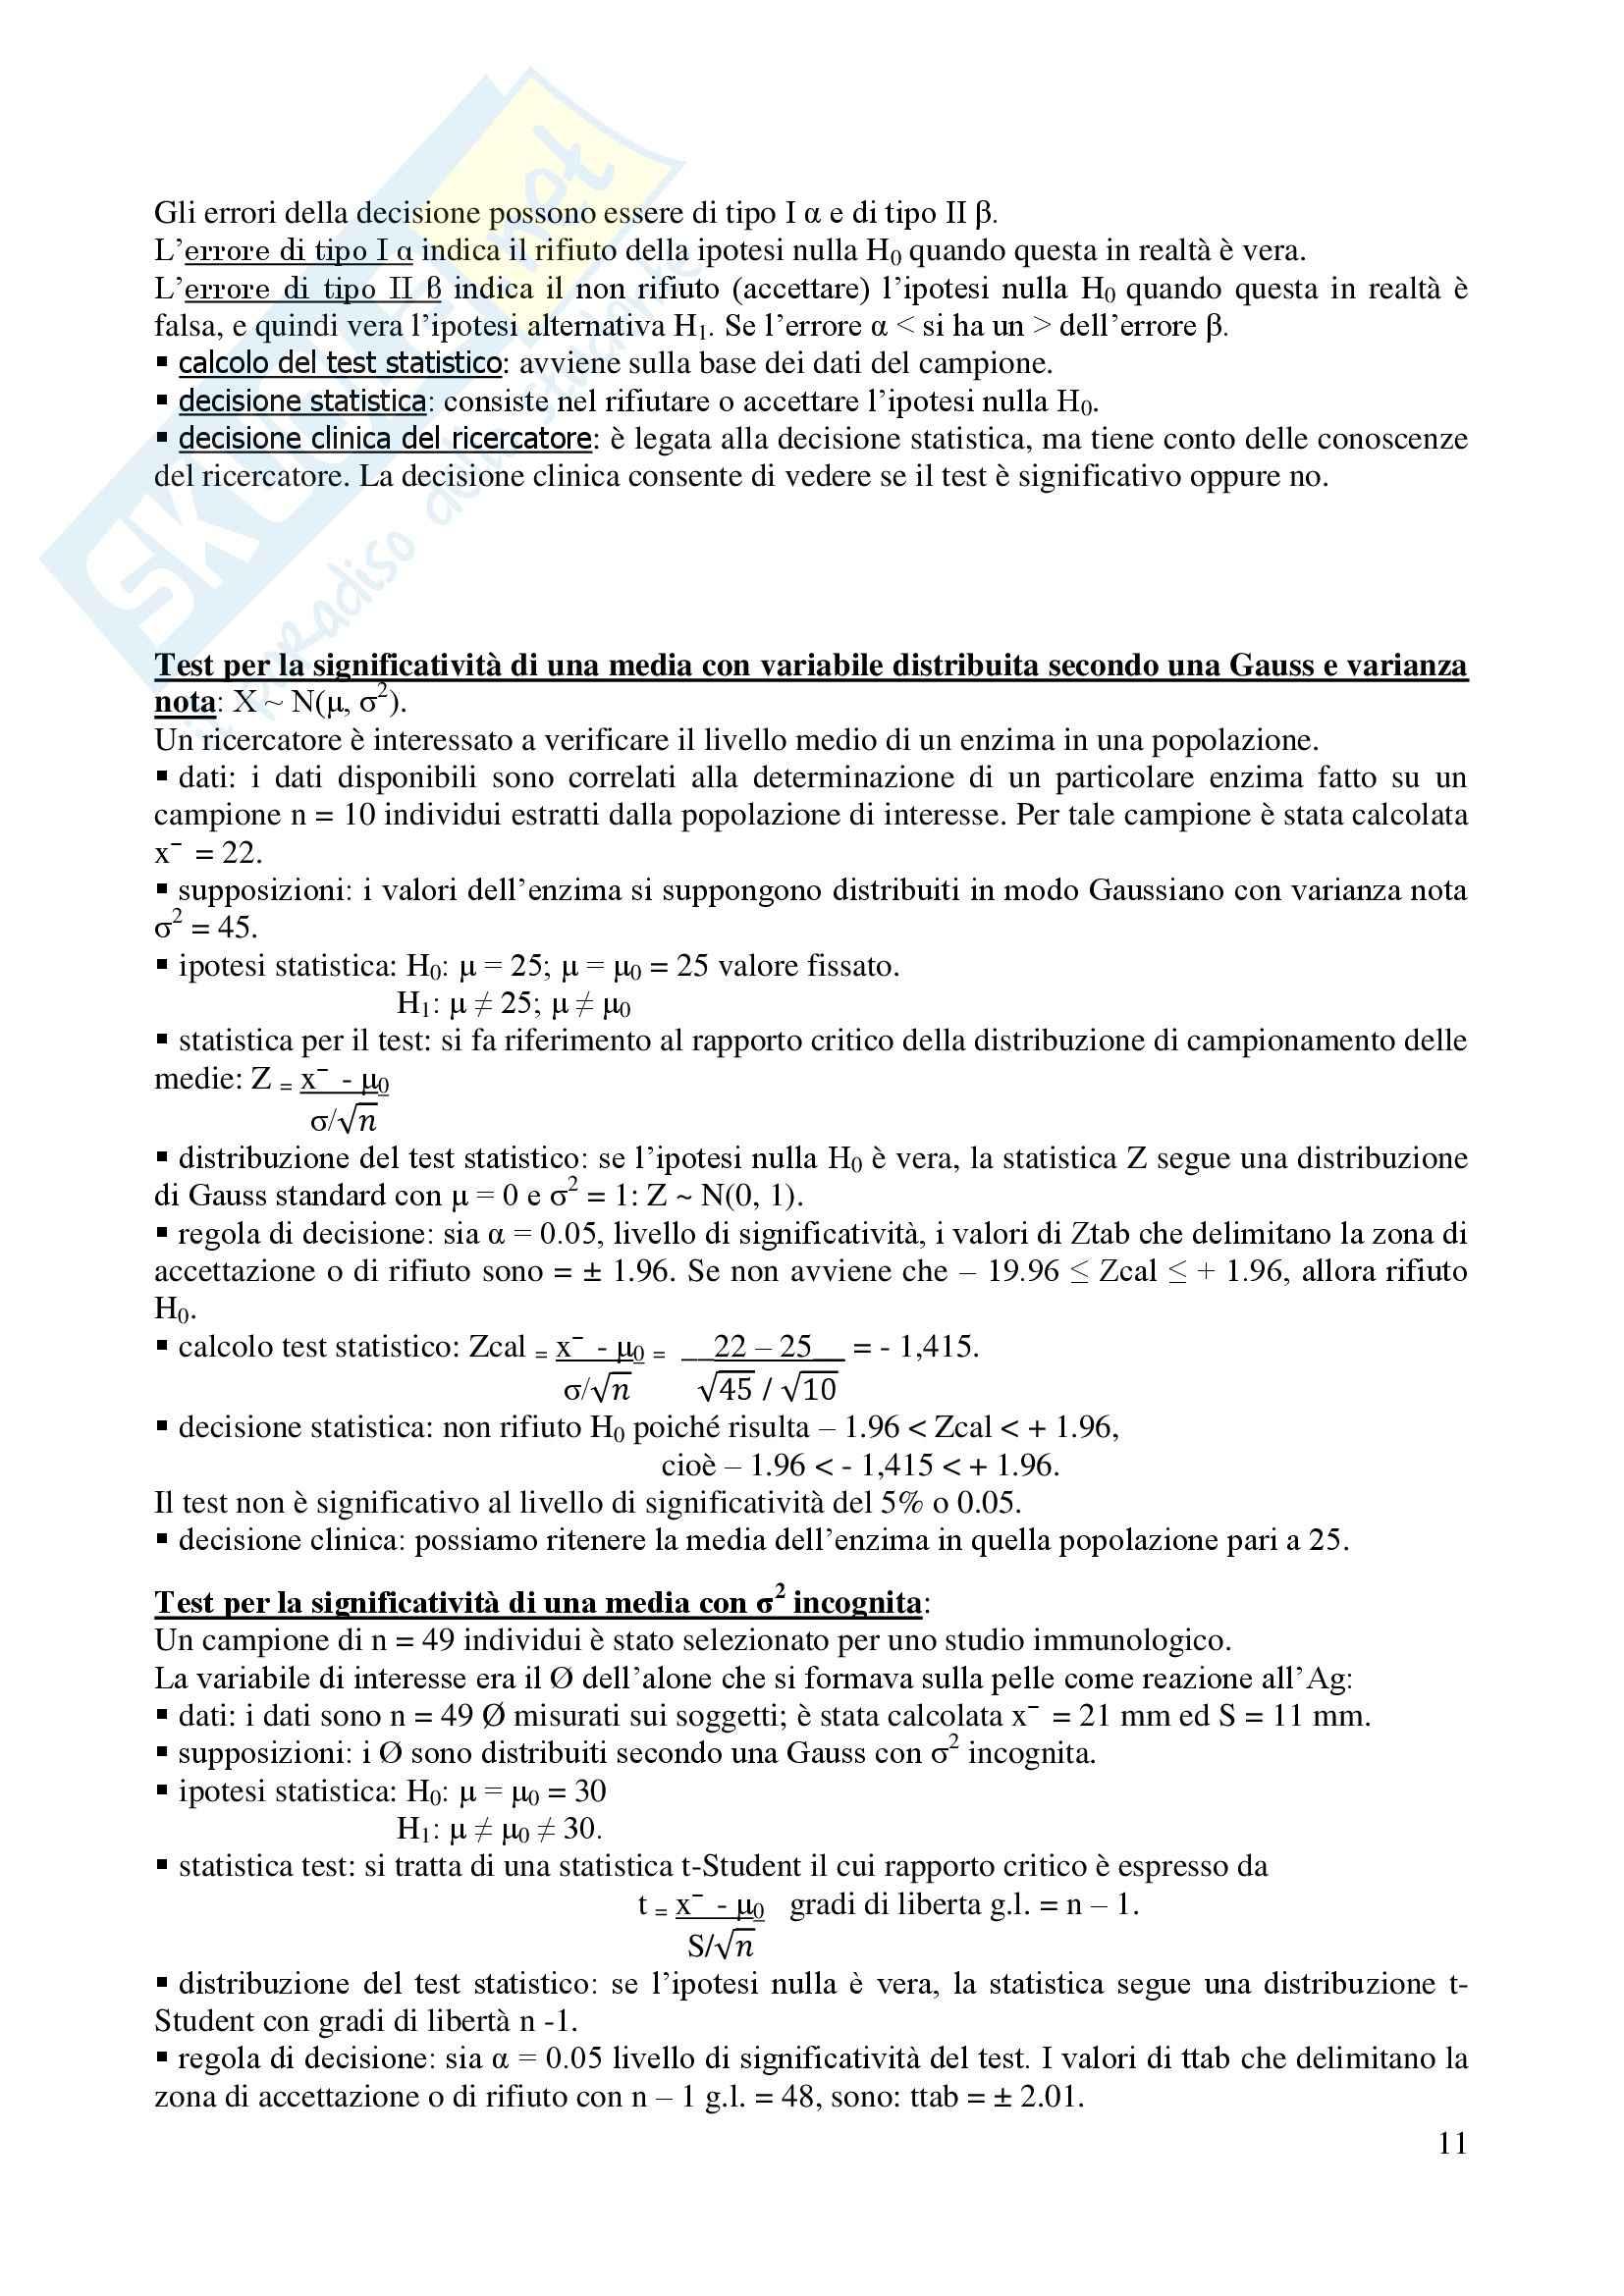 Statistica - Appunti Pag. 11